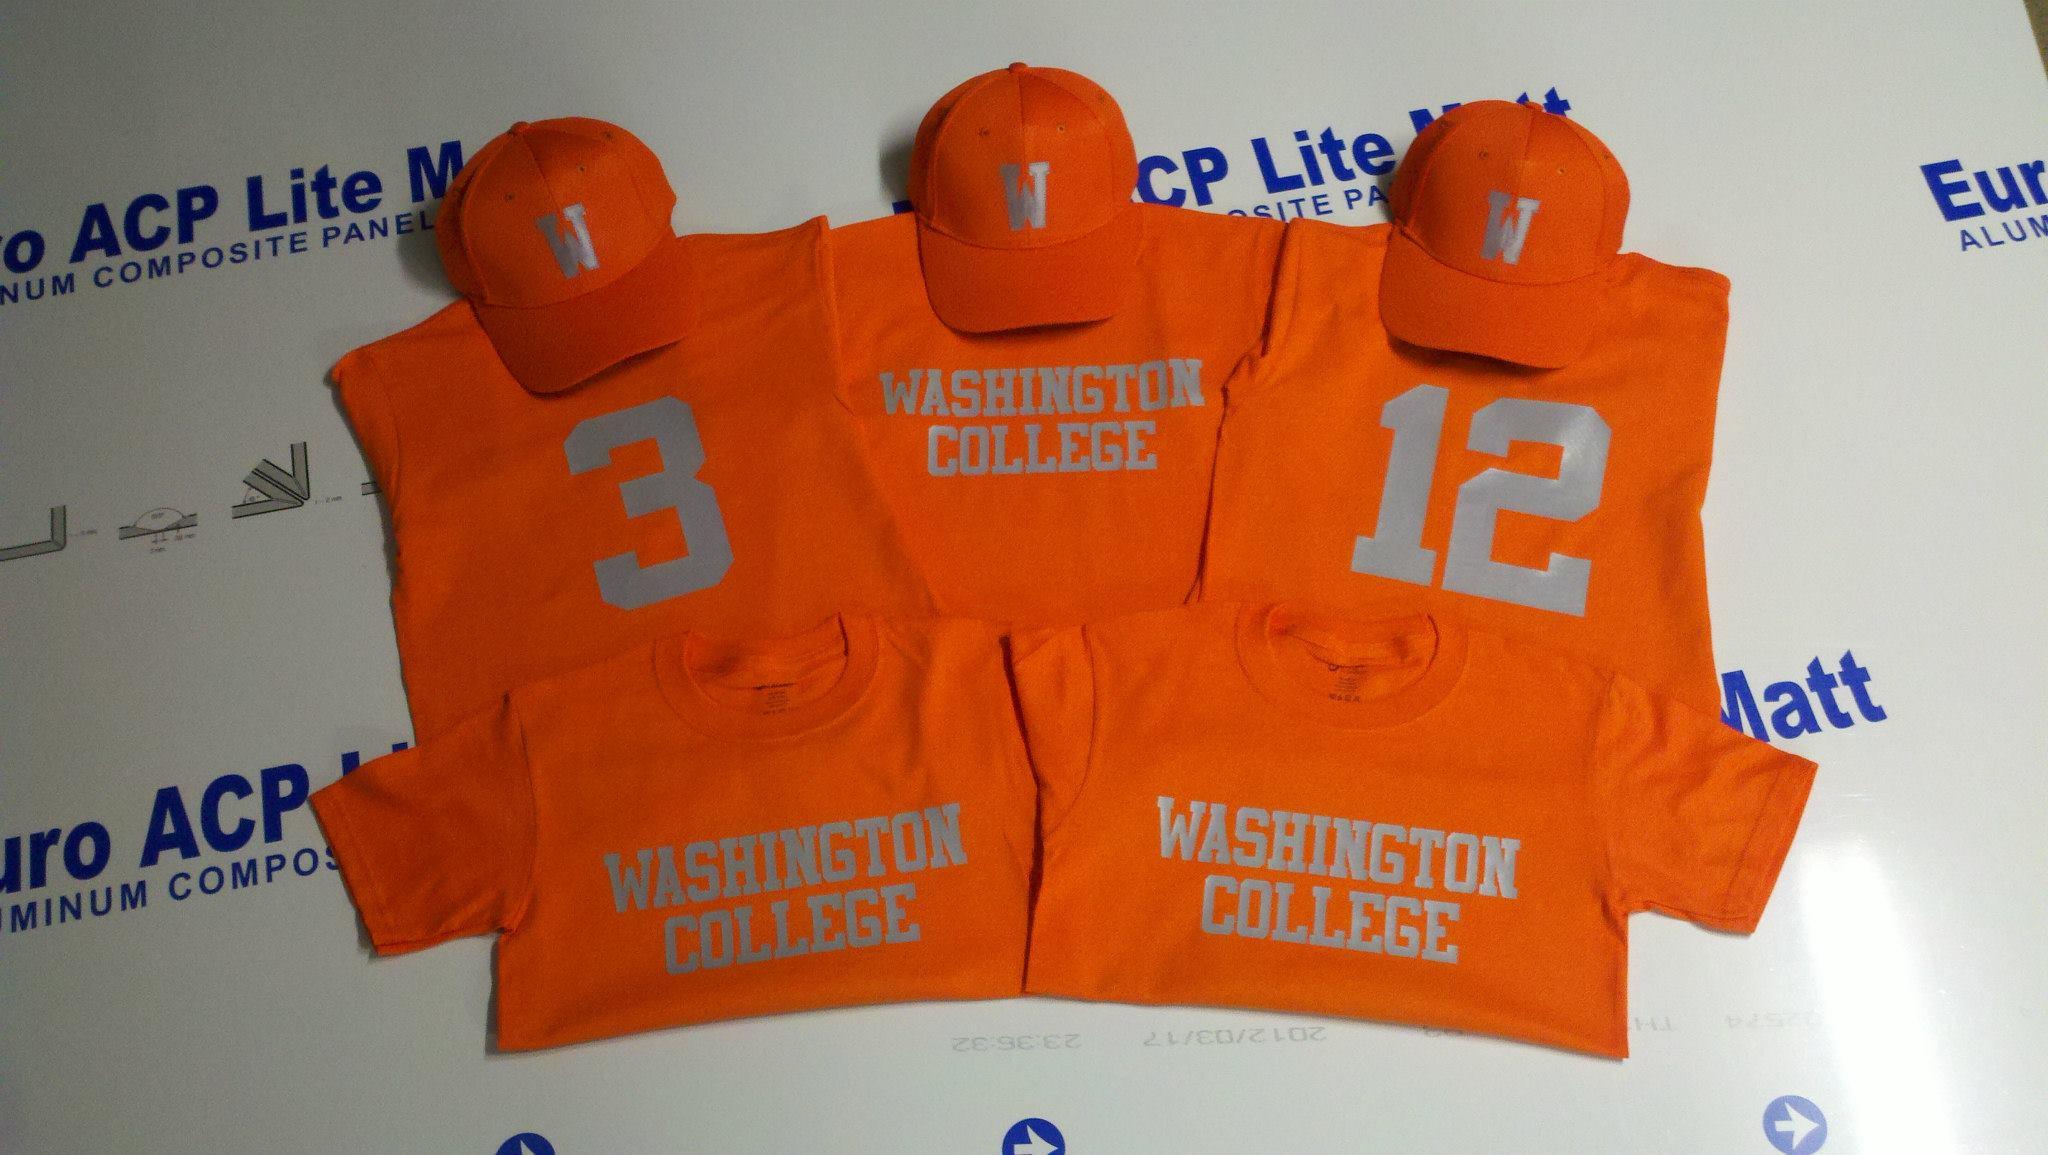 Washington College Softball